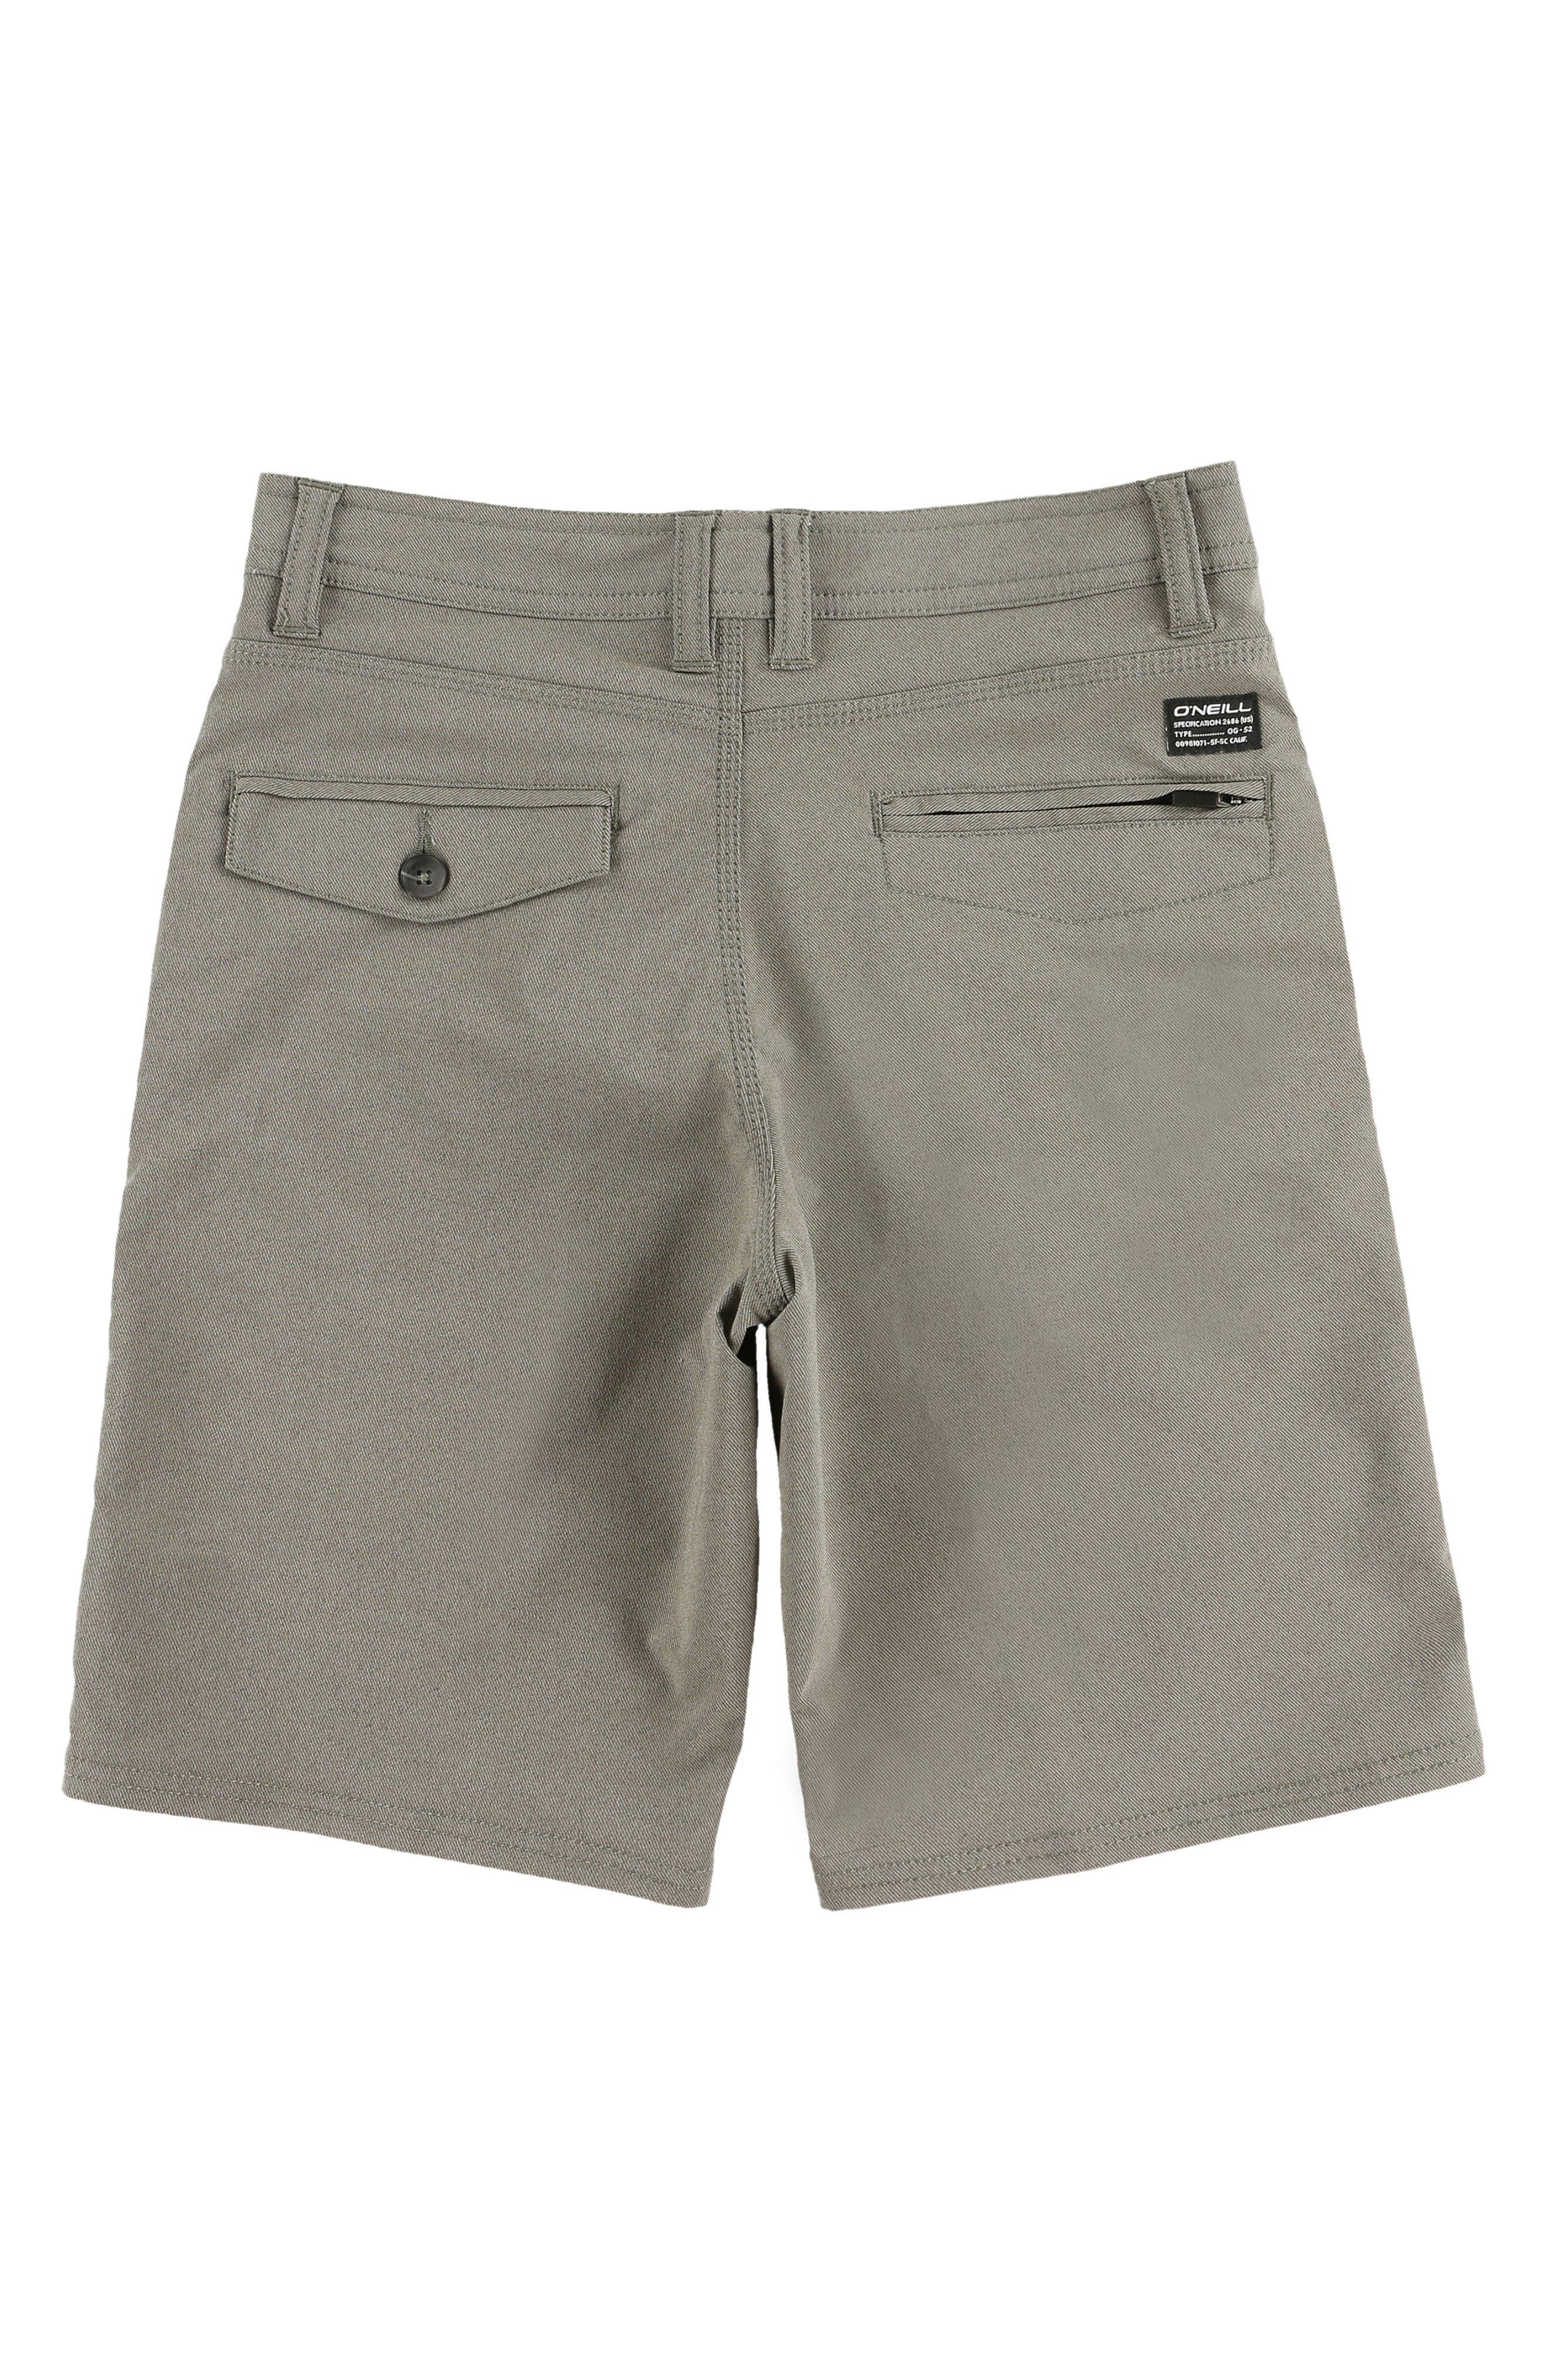 Stockton Hybrid Shorts,                             Alternate thumbnail 2, color,                             COFFEE